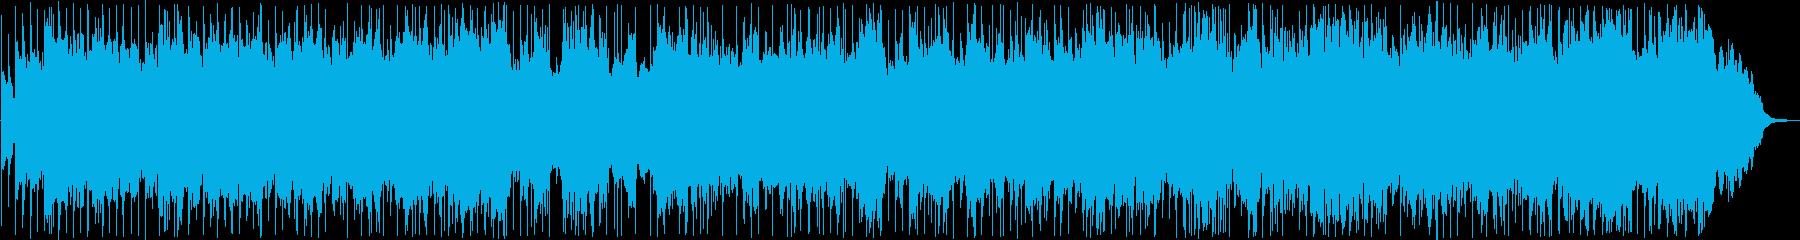 Nakunini / Okinawan folk song's reproduced waveform